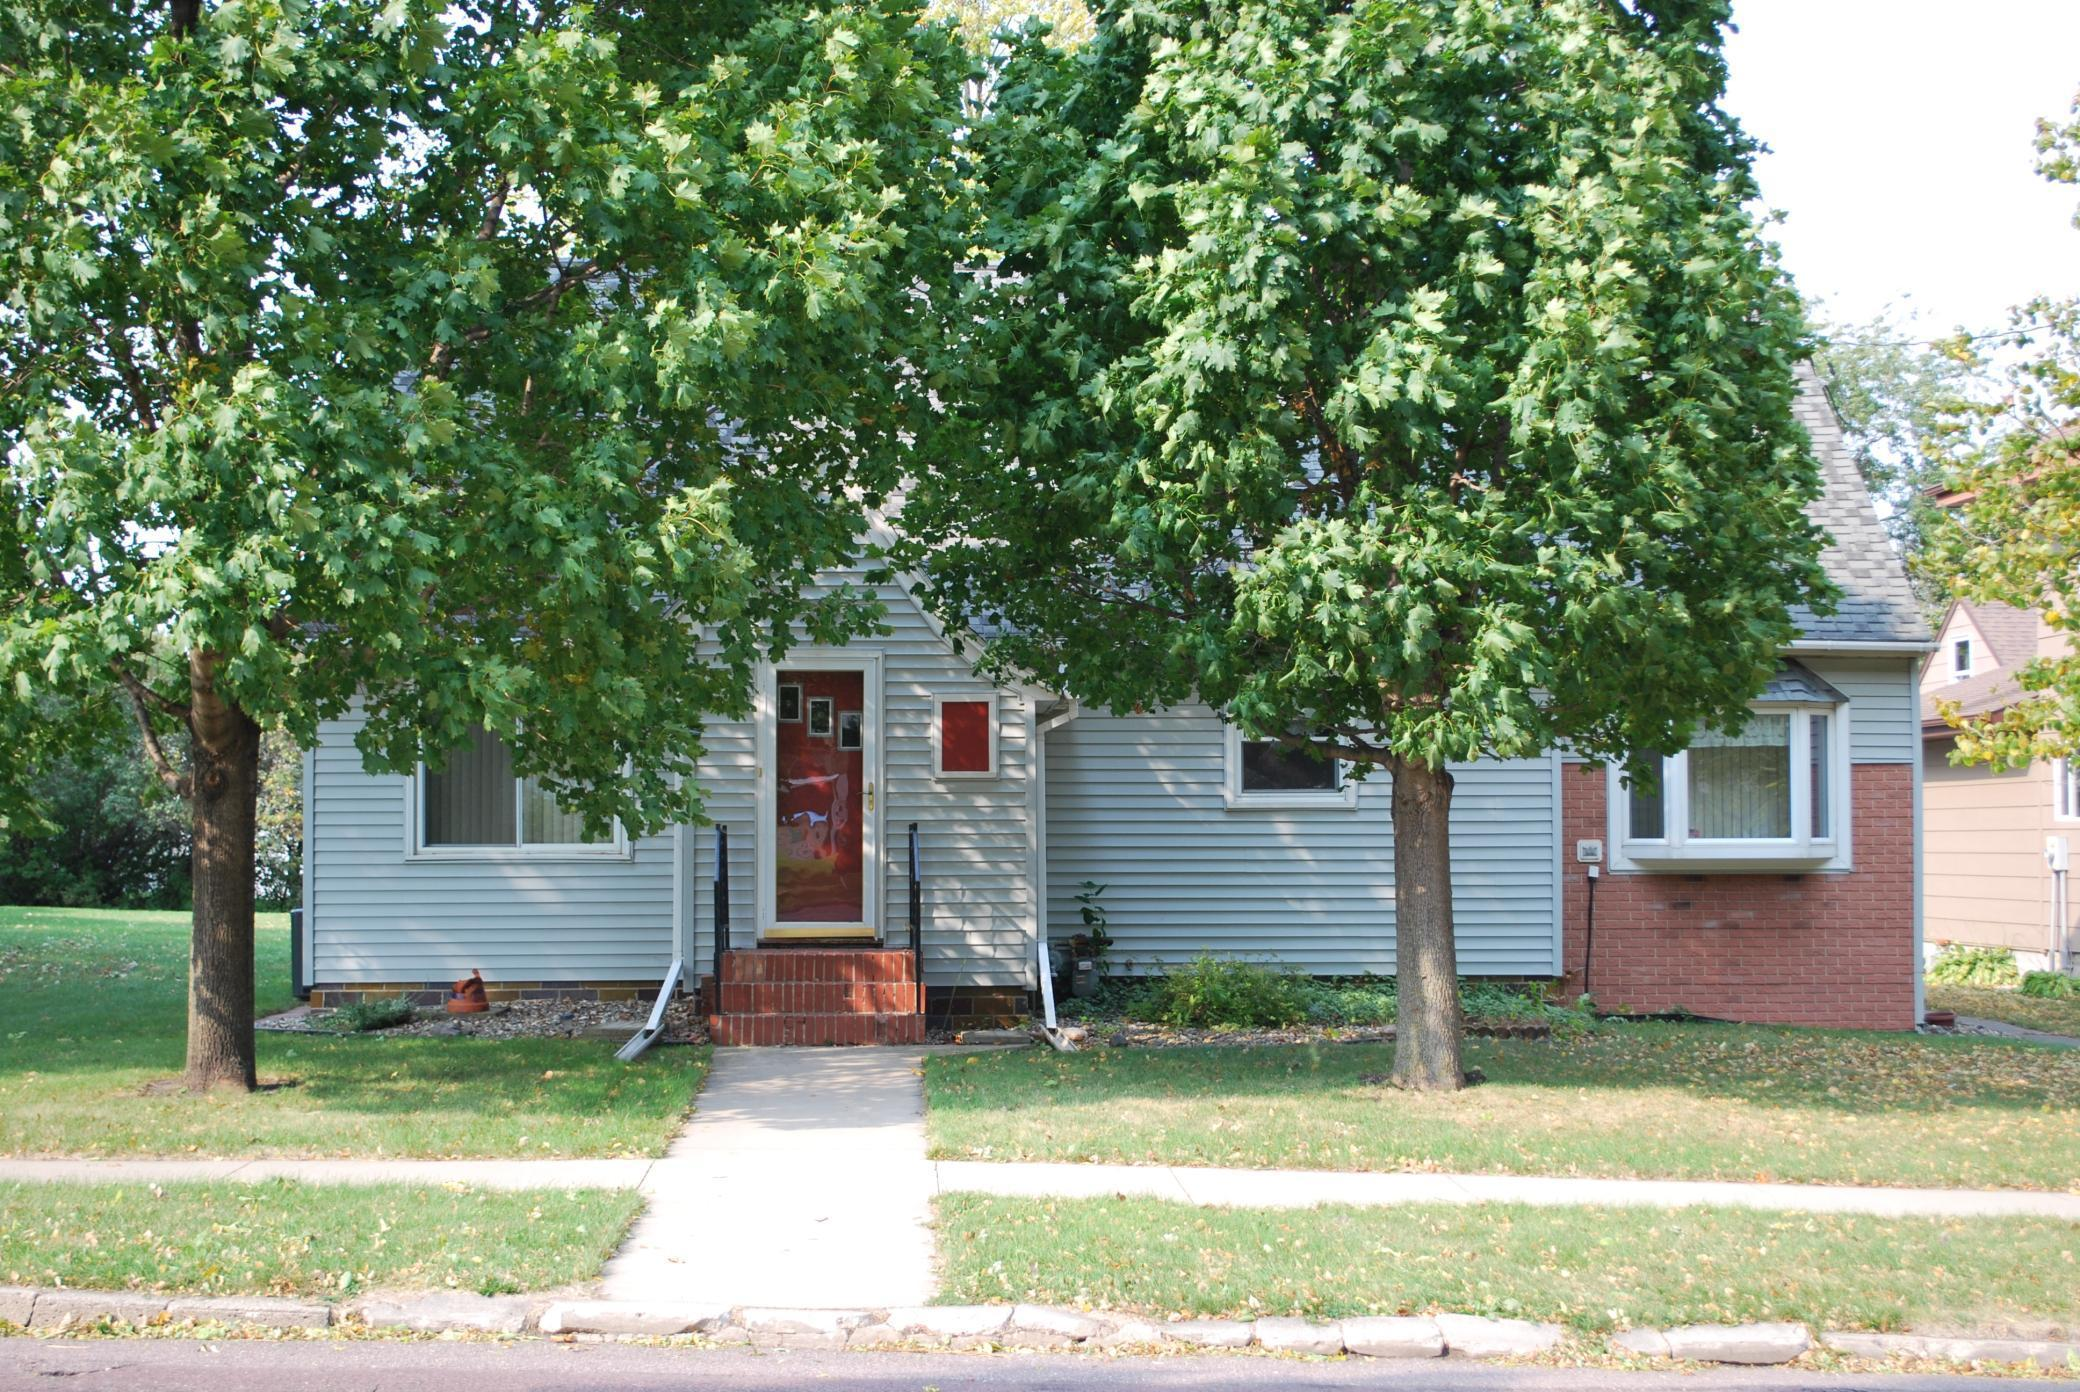 105 E 2nd Street Property Photo - Sherburn, MN real estate listing